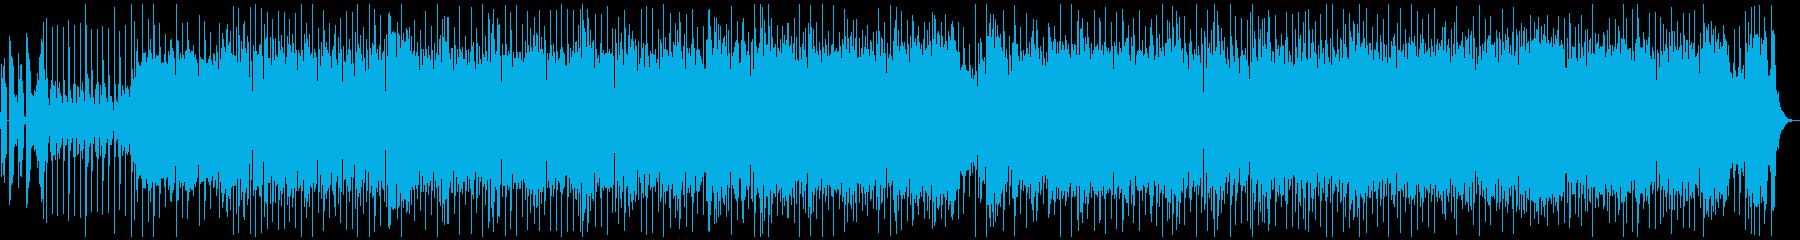 OP風、躍動感、ロック、勢い、EGメロの再生済みの波形